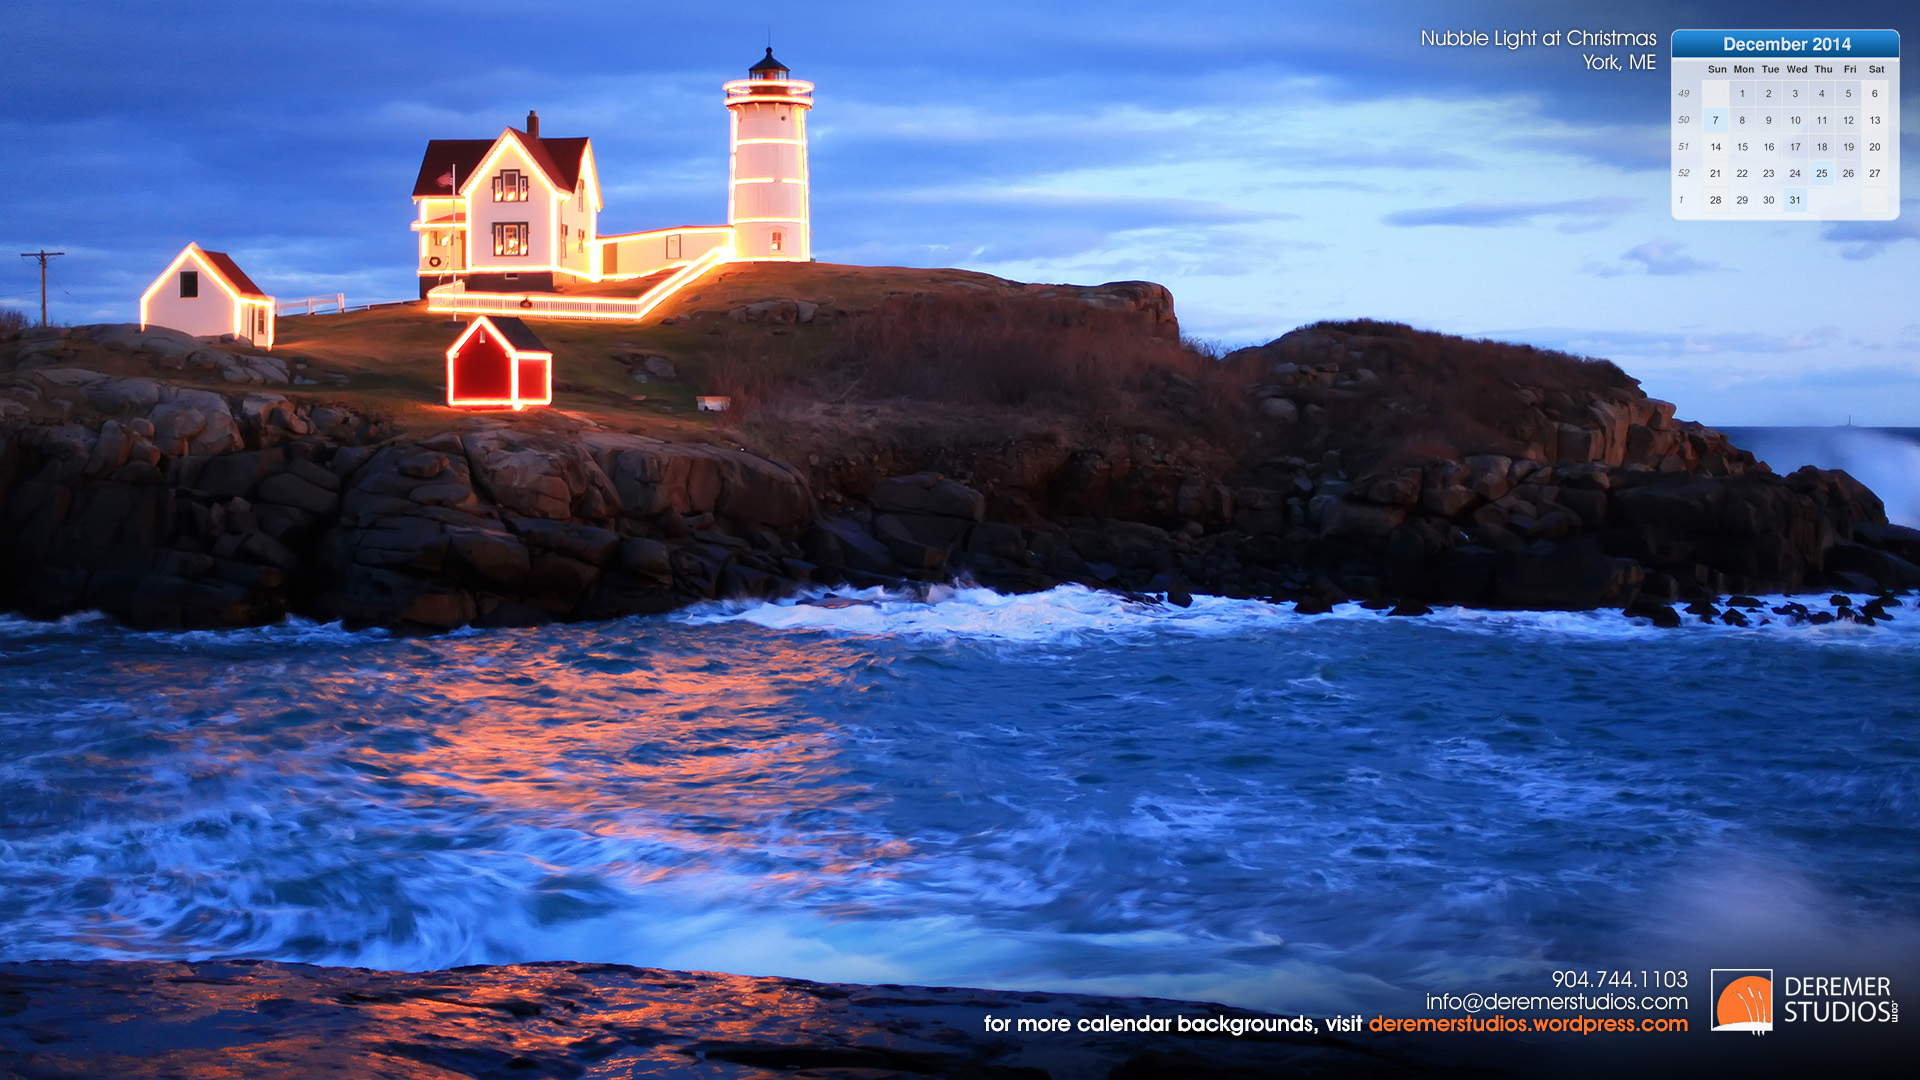 43 Lighthouse Christmas Wallpaper On Wallpapersafari Images, Photos, Reviews